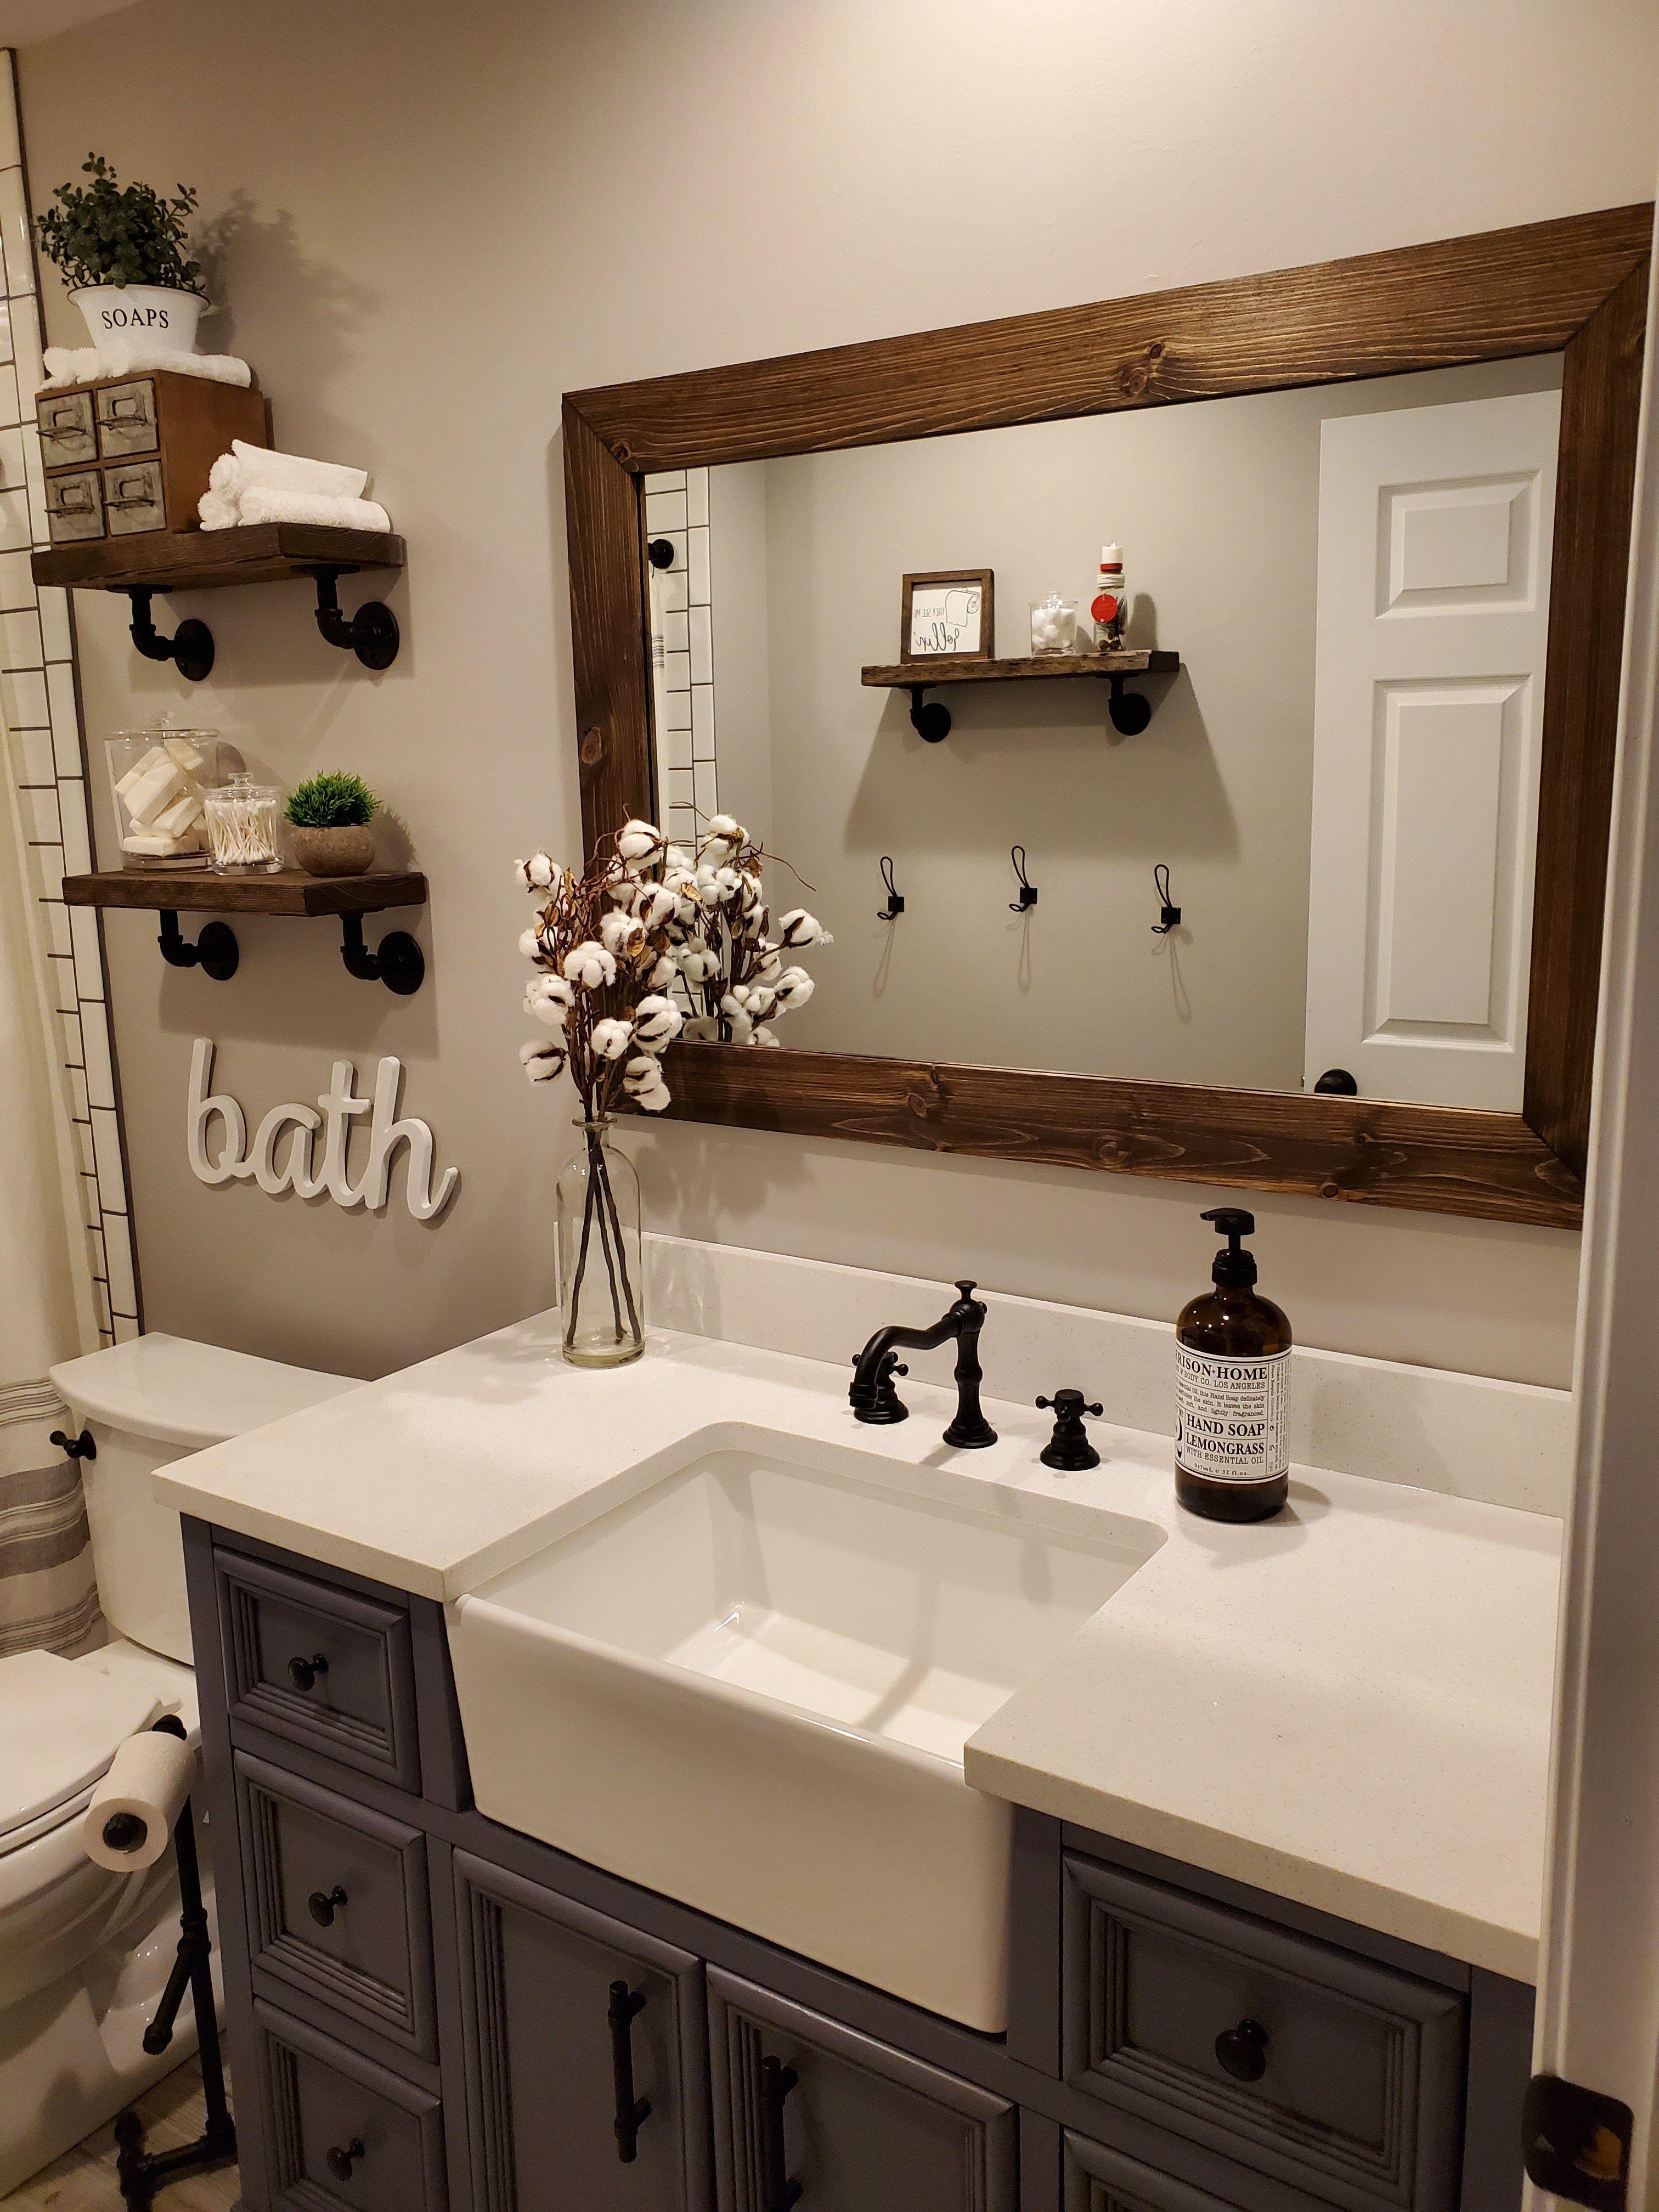 Handmade Shiplap Mirror and Shelves